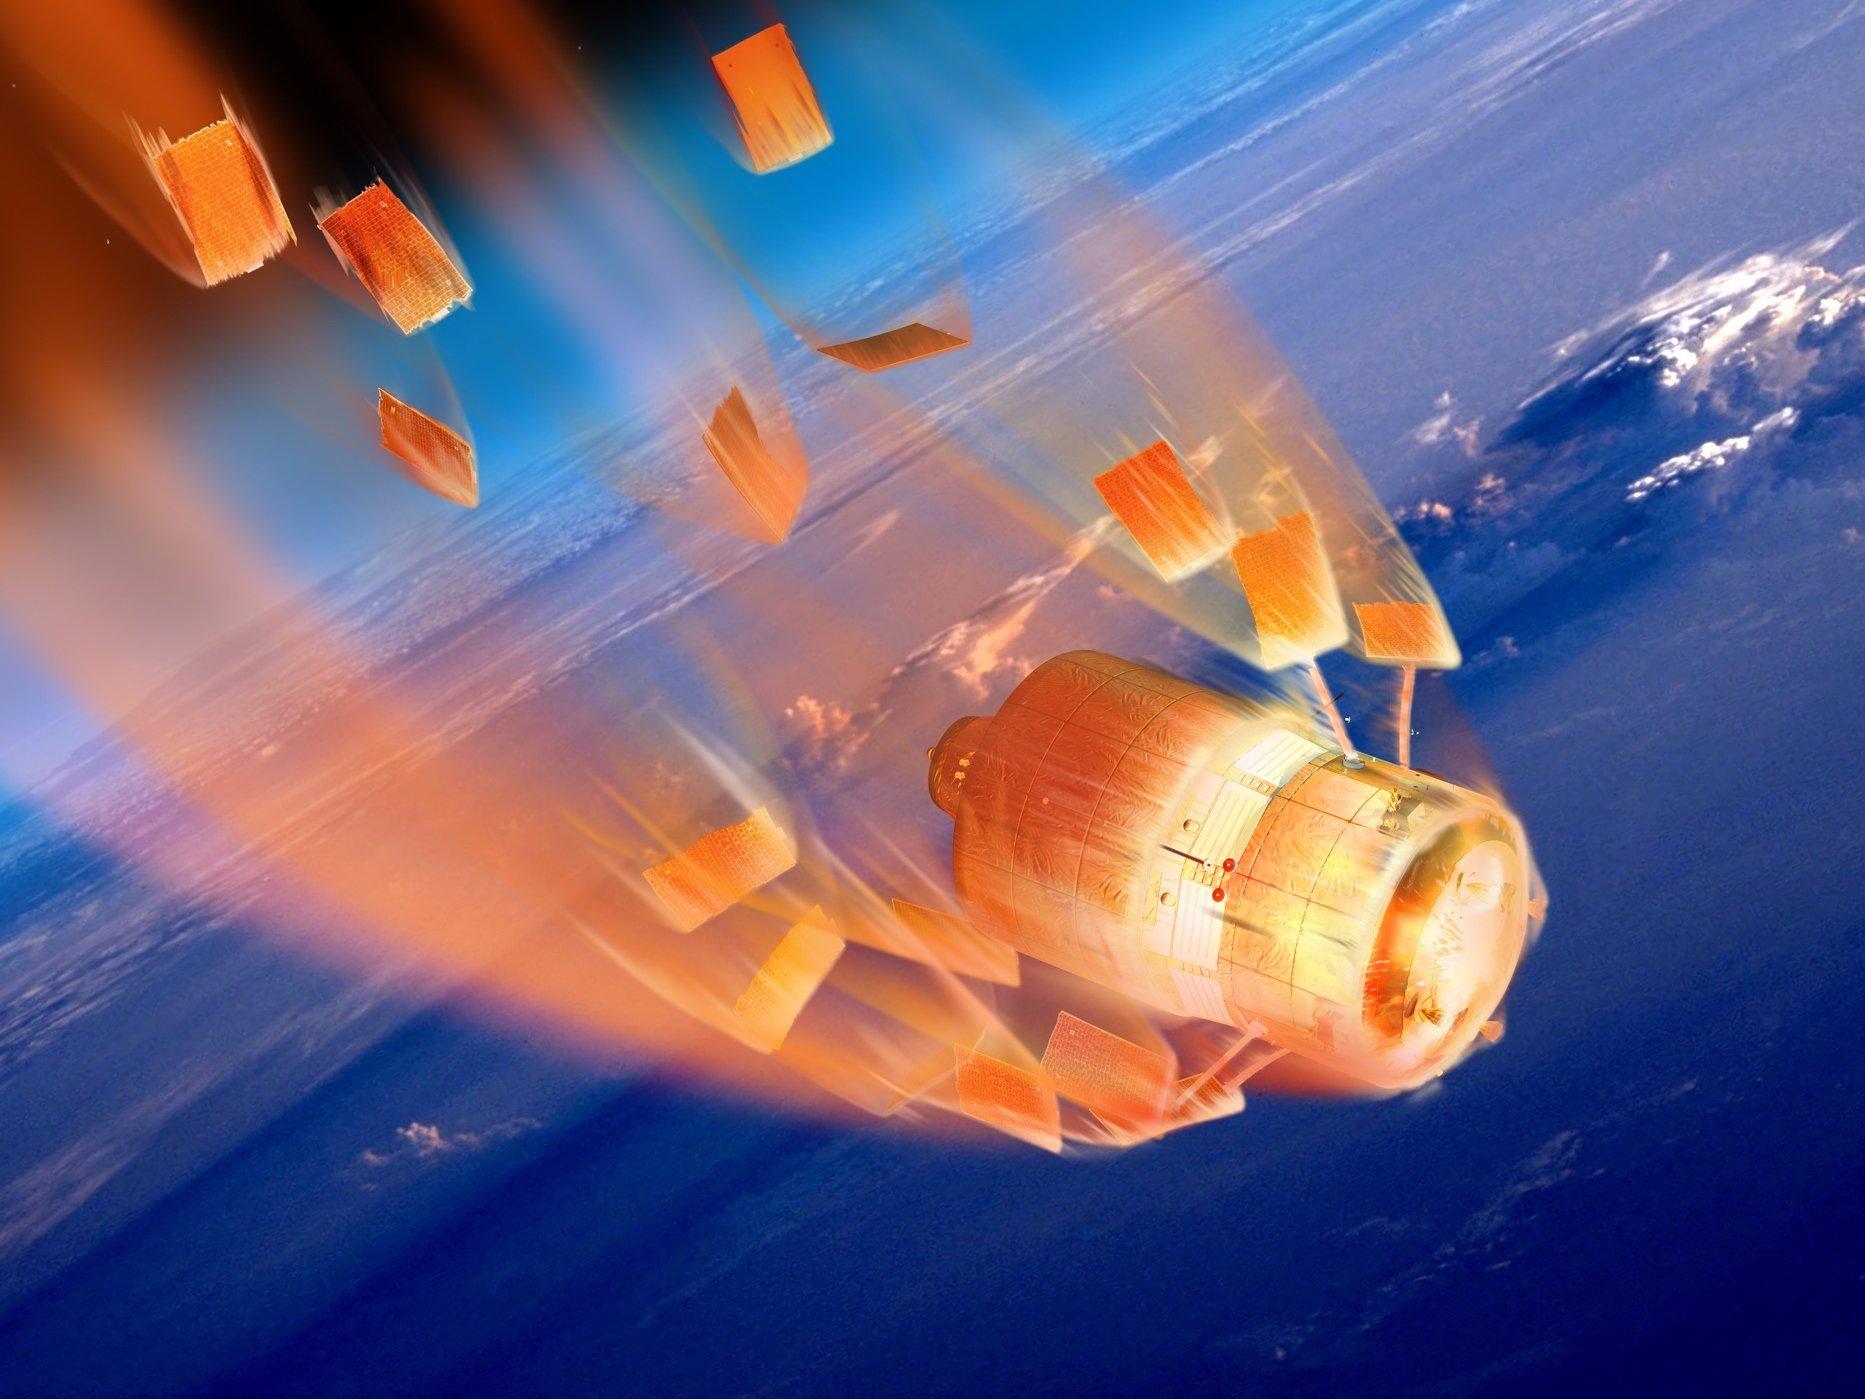 atv spacecraft atmospheric reentry burning up fireball esa d ducros